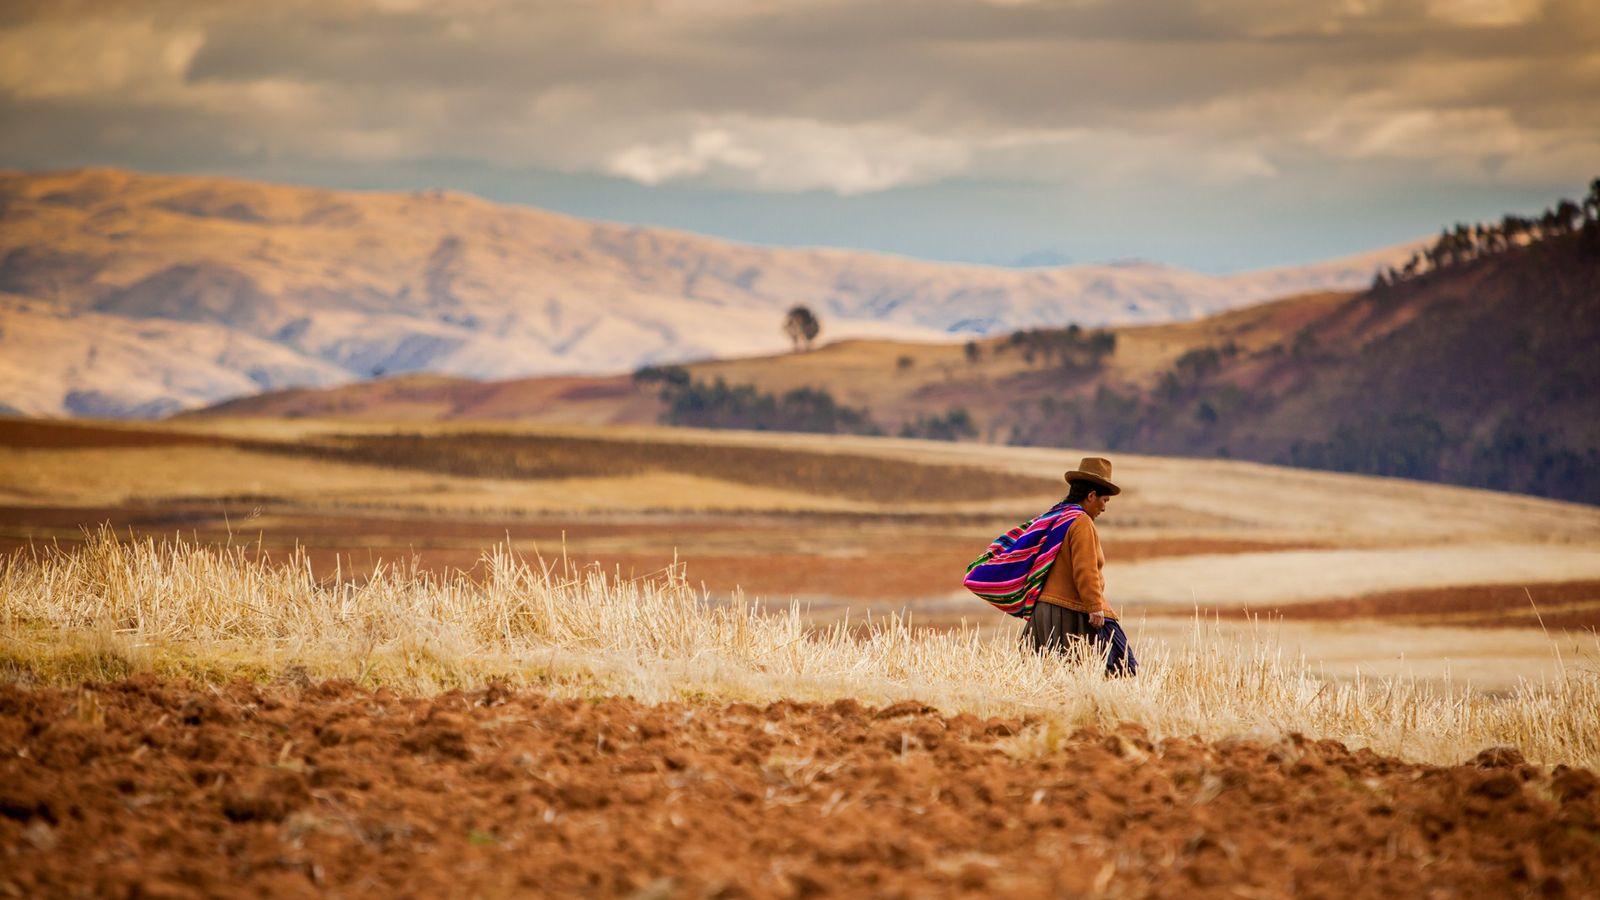 Farming in the Andes near Urubamba